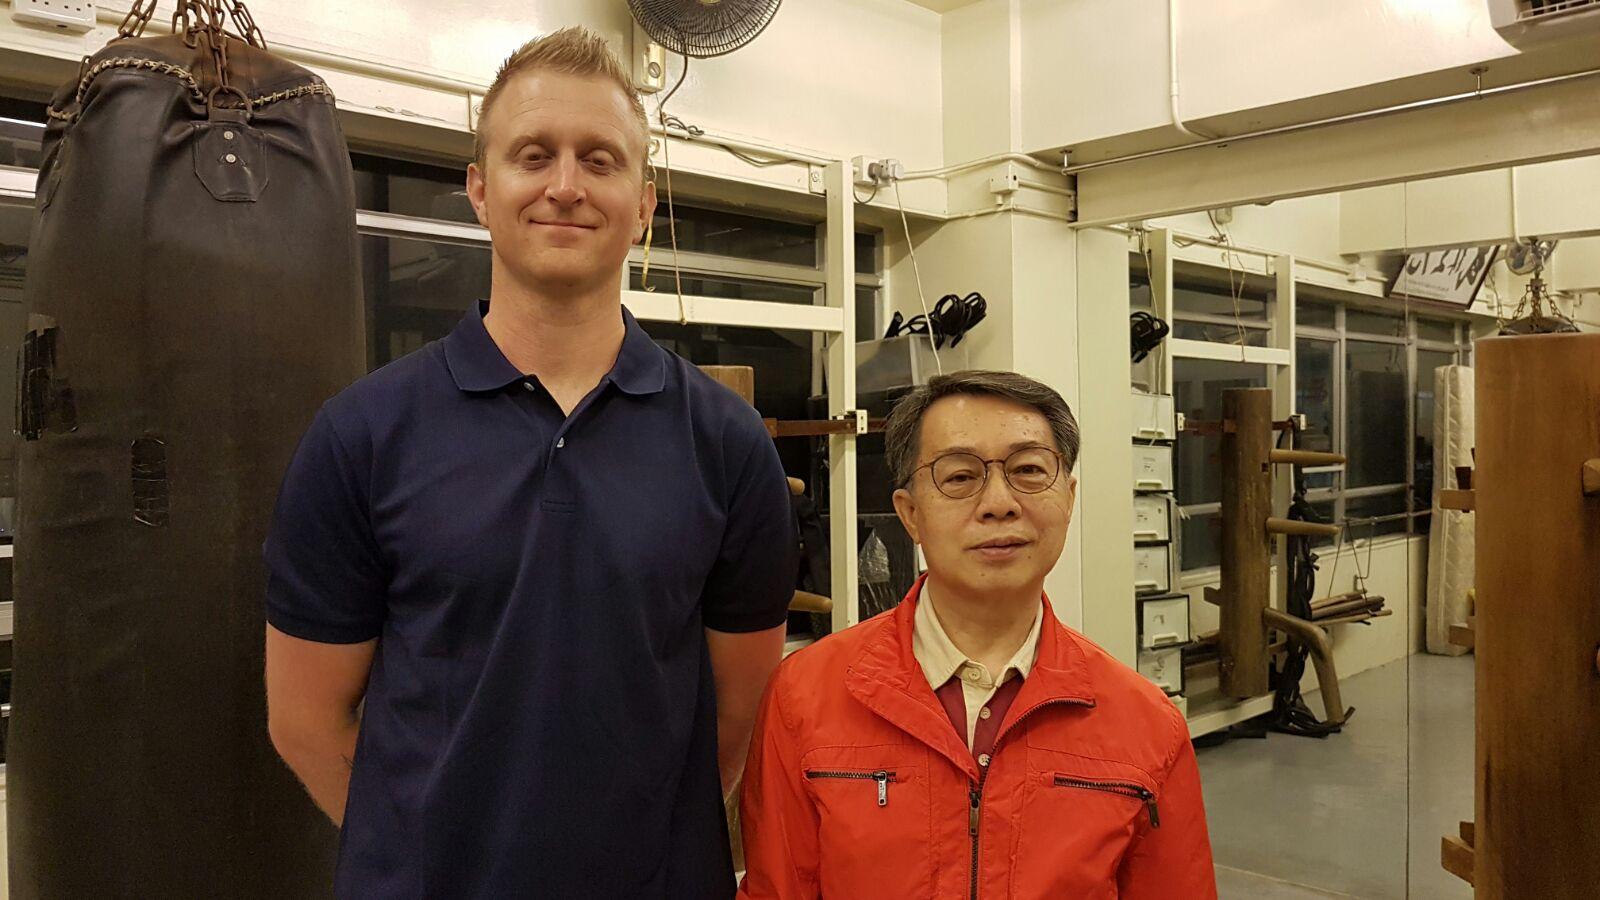 Robert Ley With his Sihing, John Xie